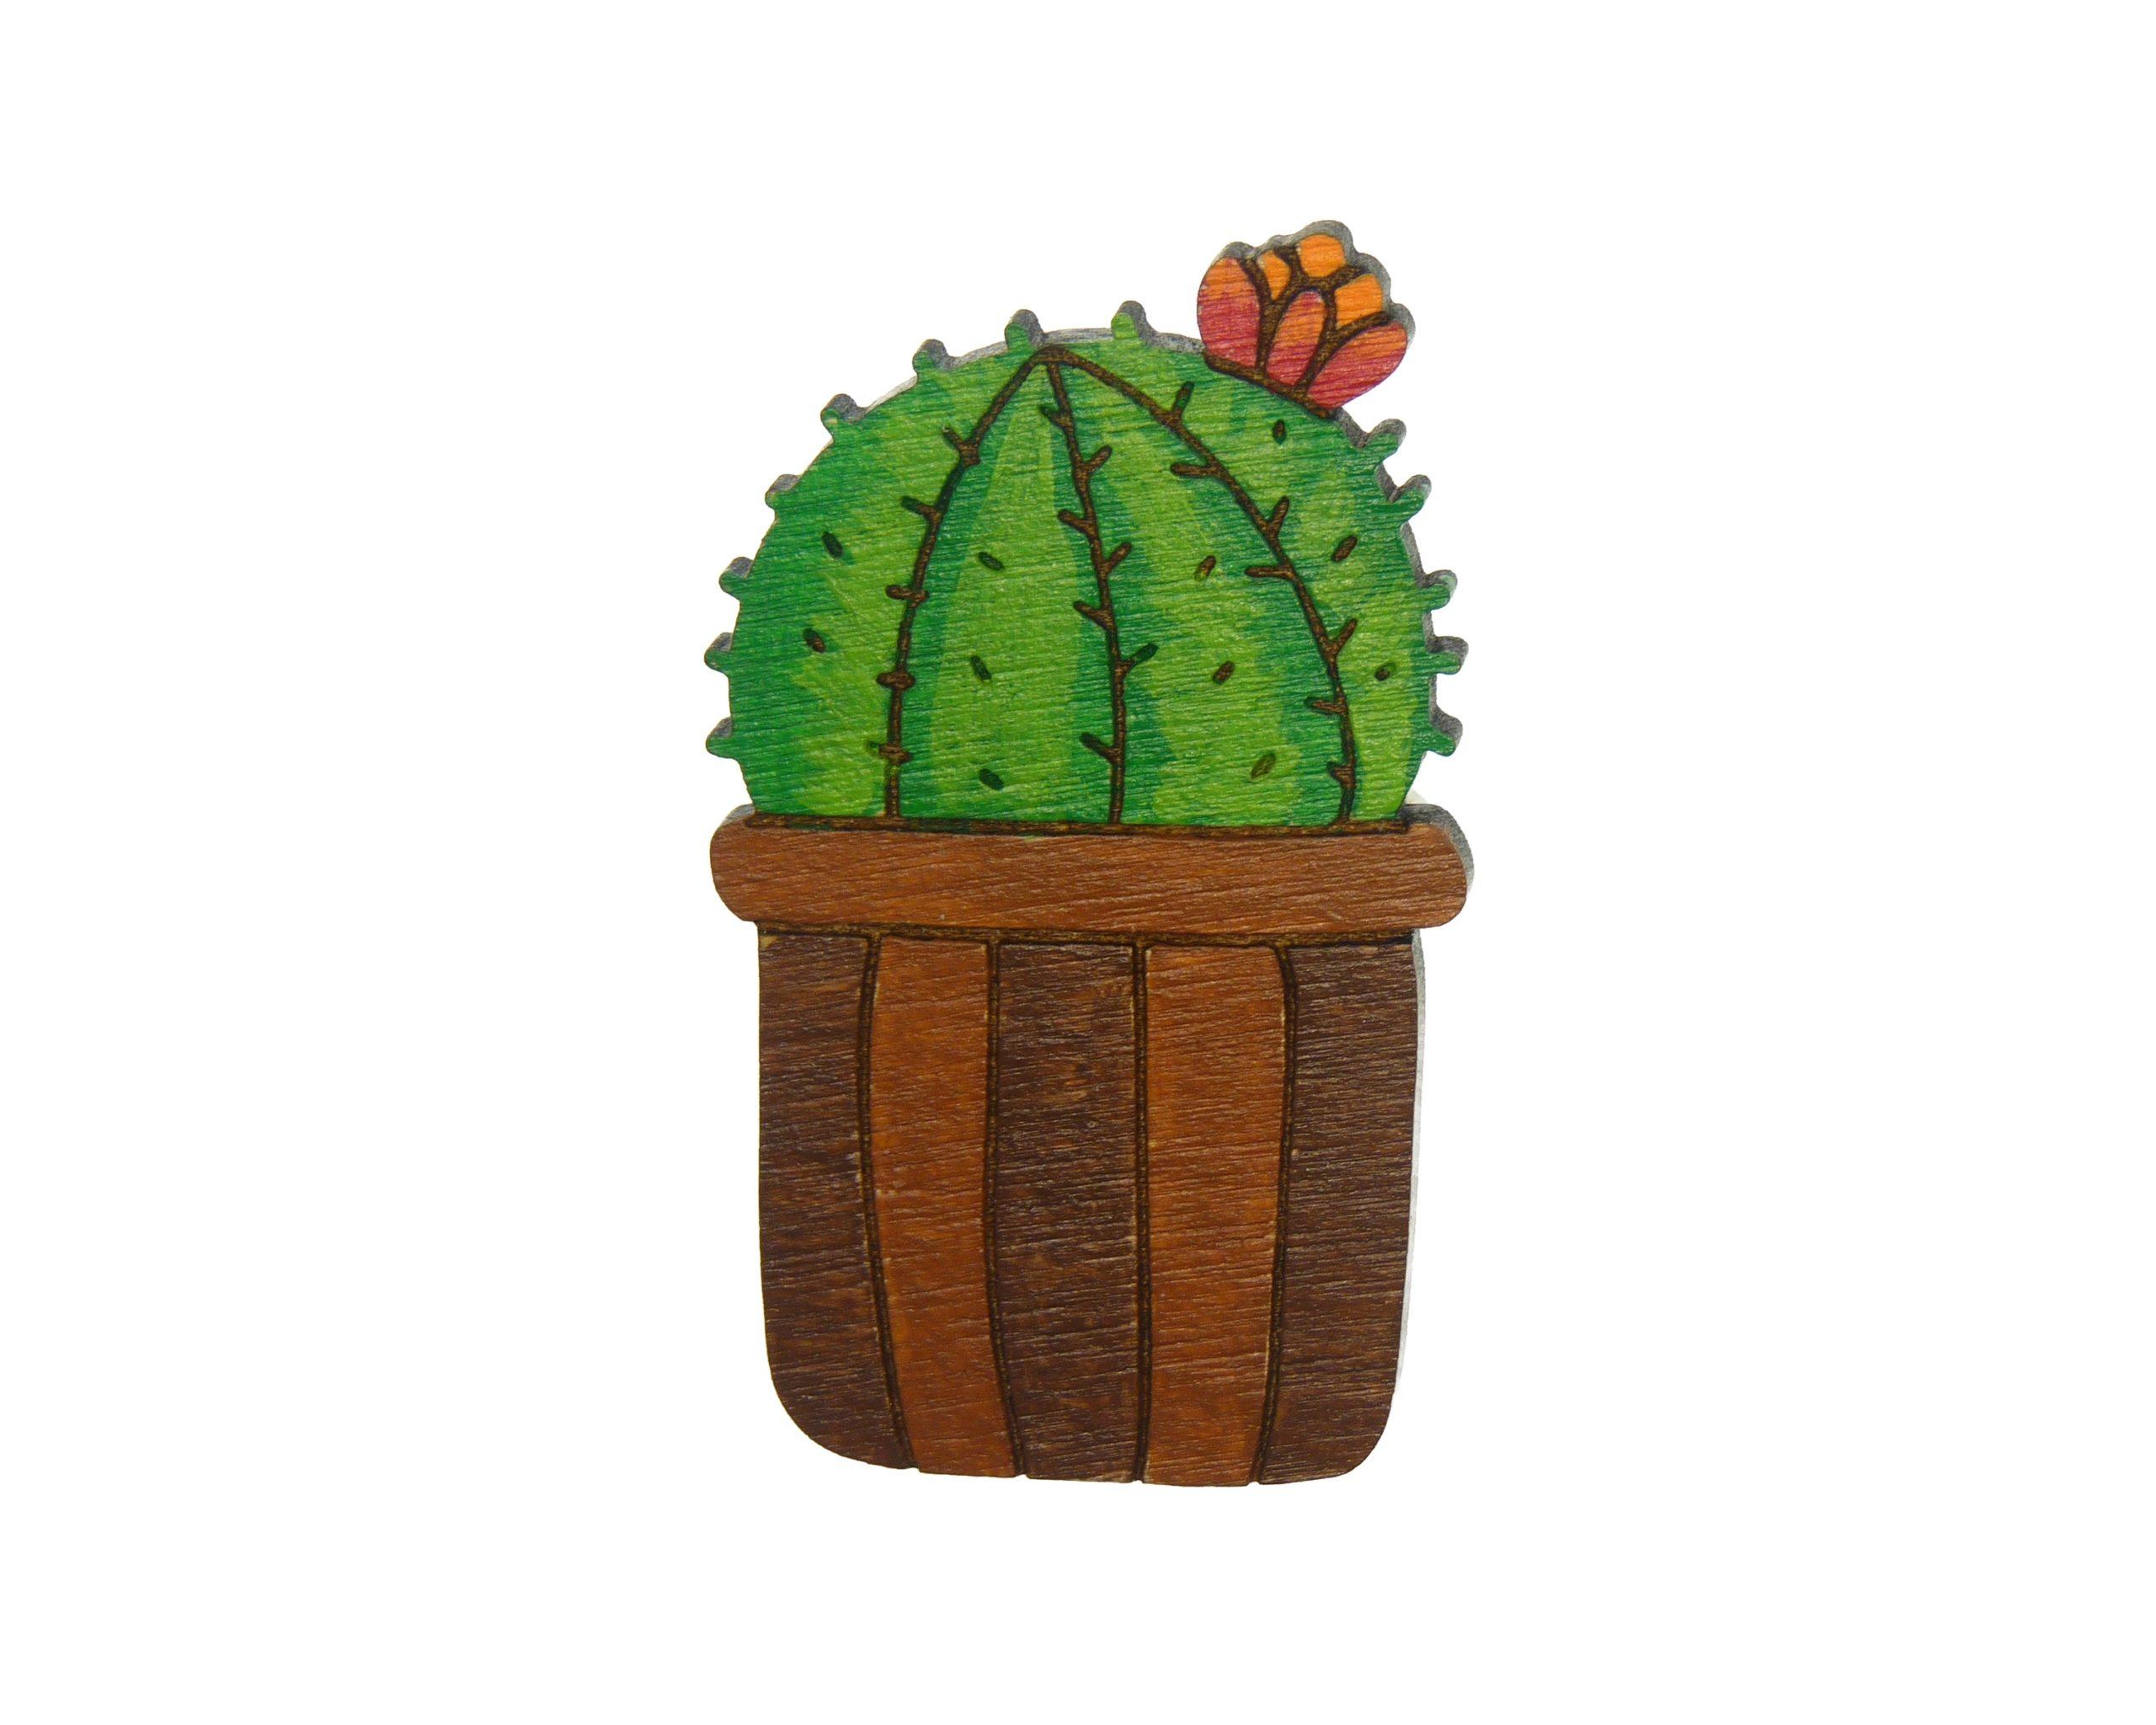 Flowering Cactus Maple Hardwood Pin | Hand Painted